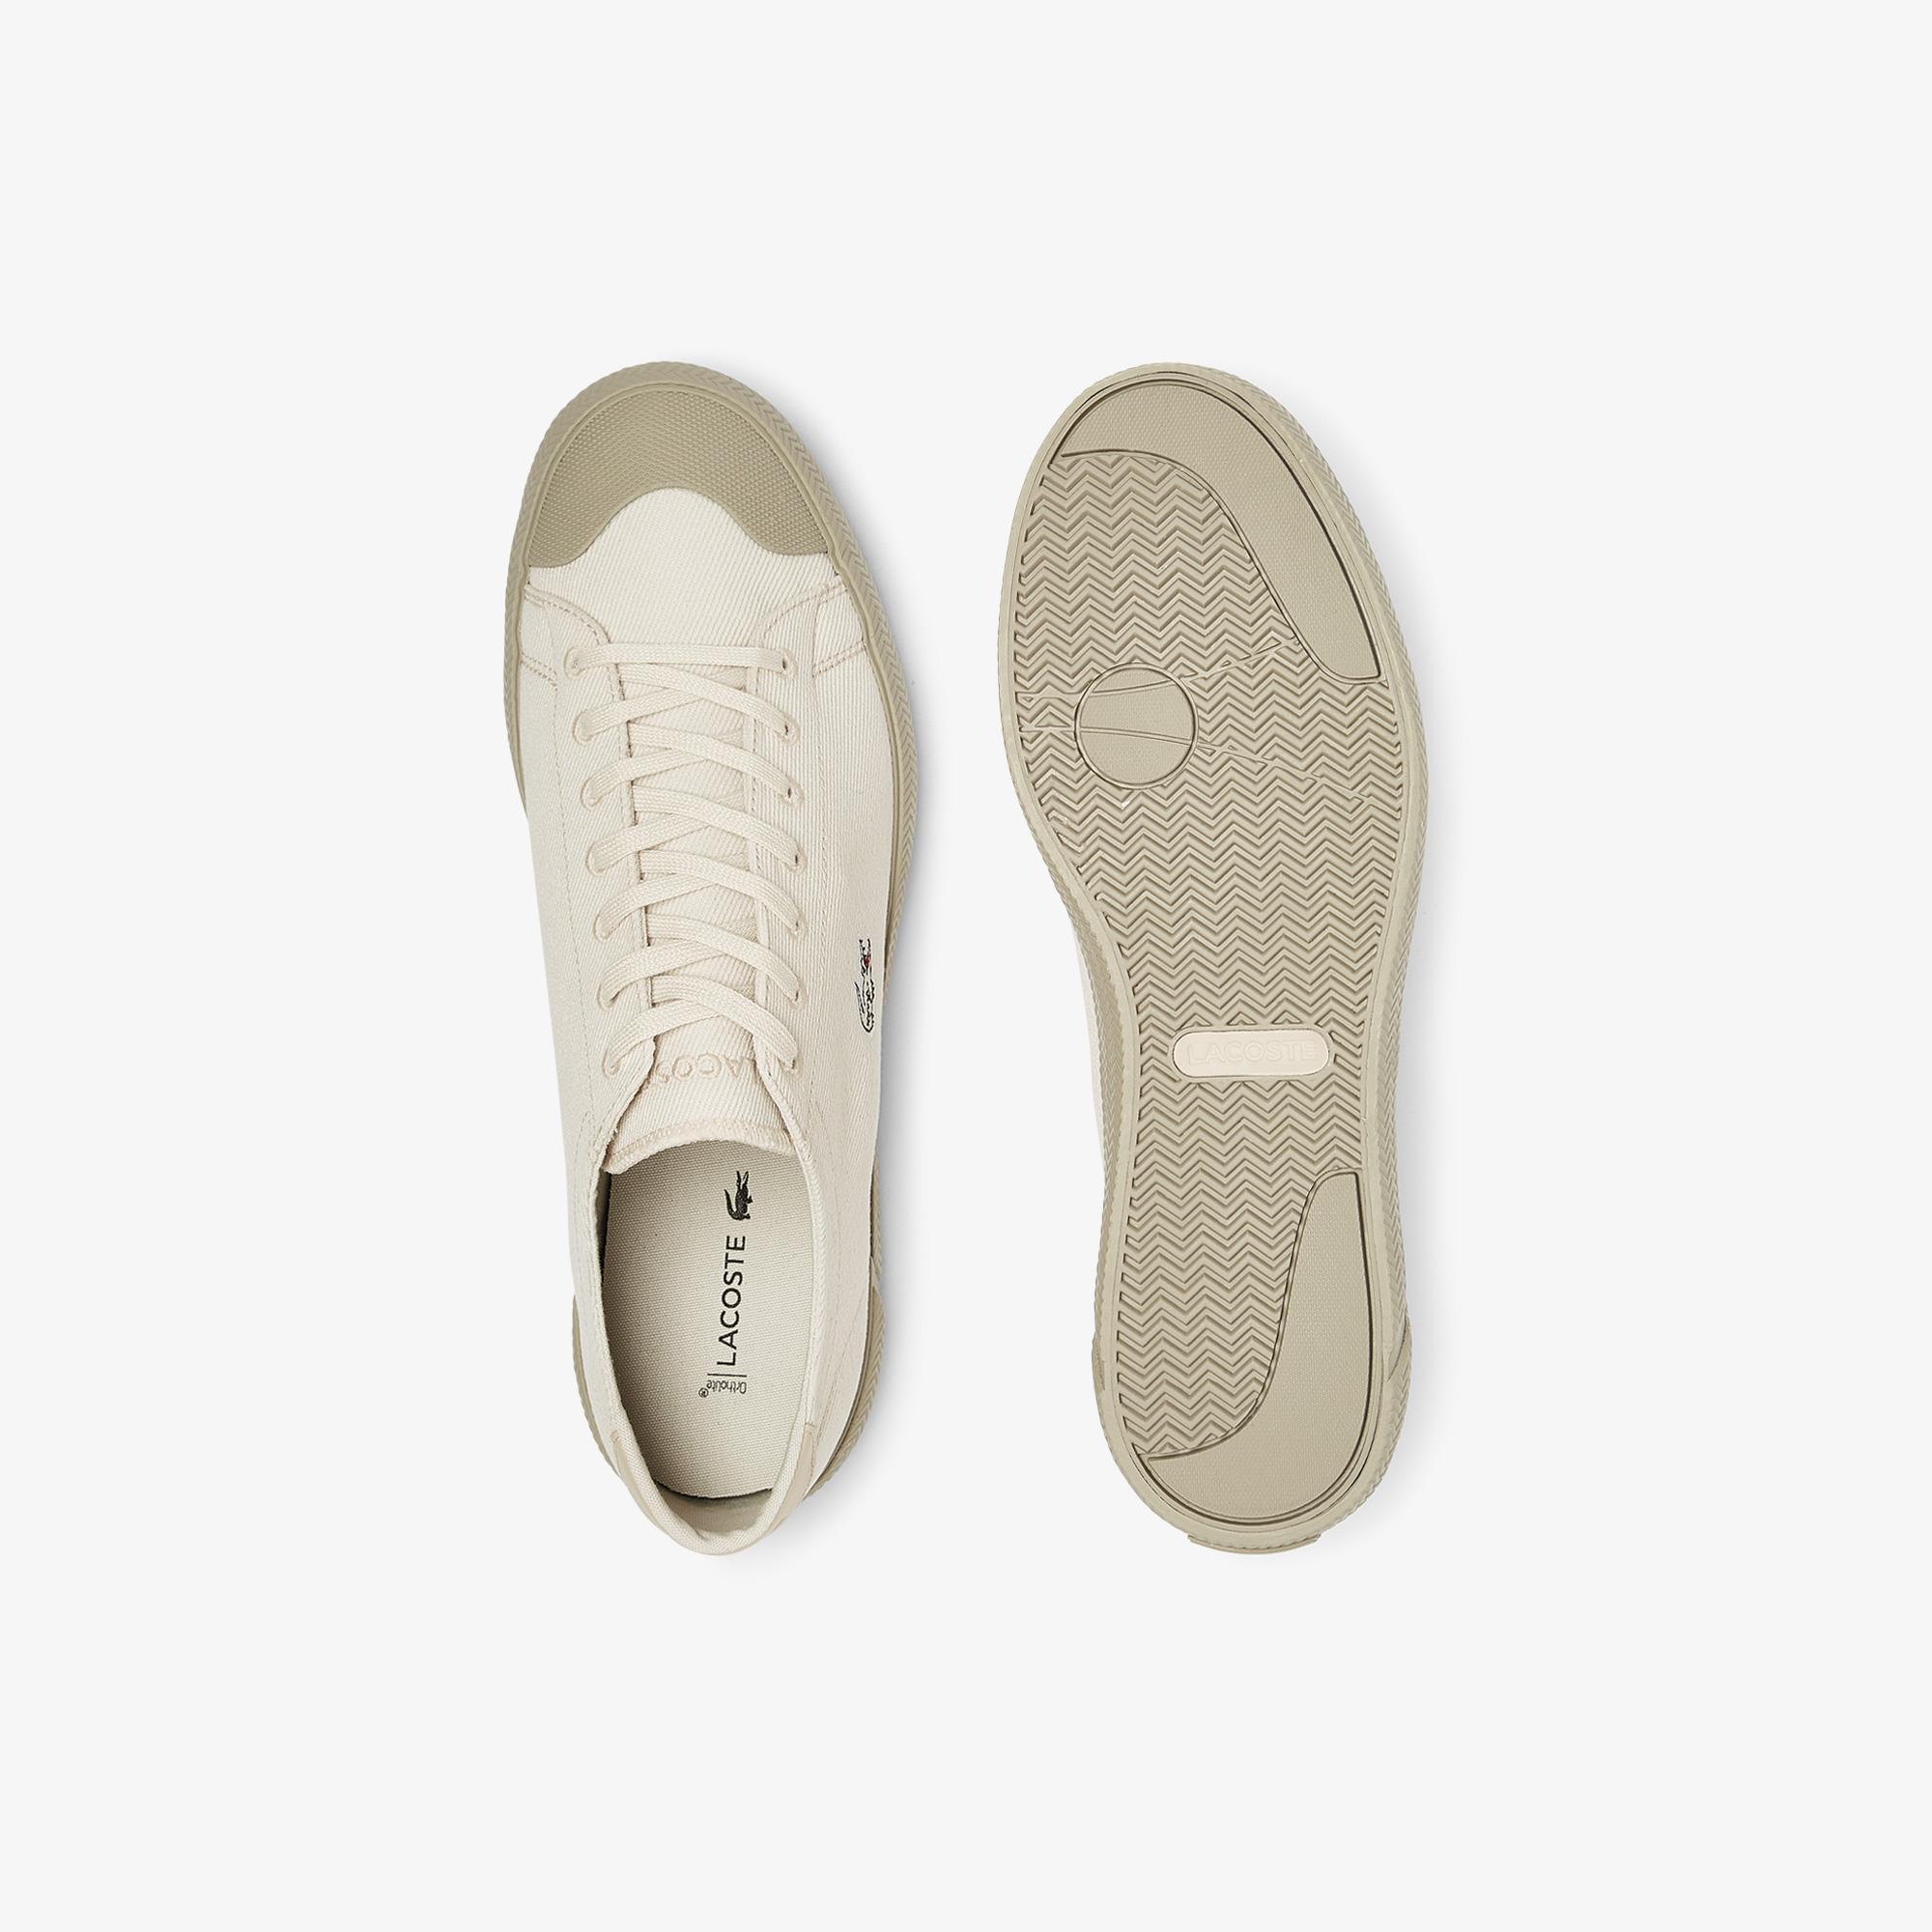 Lacoste Gripshot 1121 2 Cma Erkek Bej Sneaker